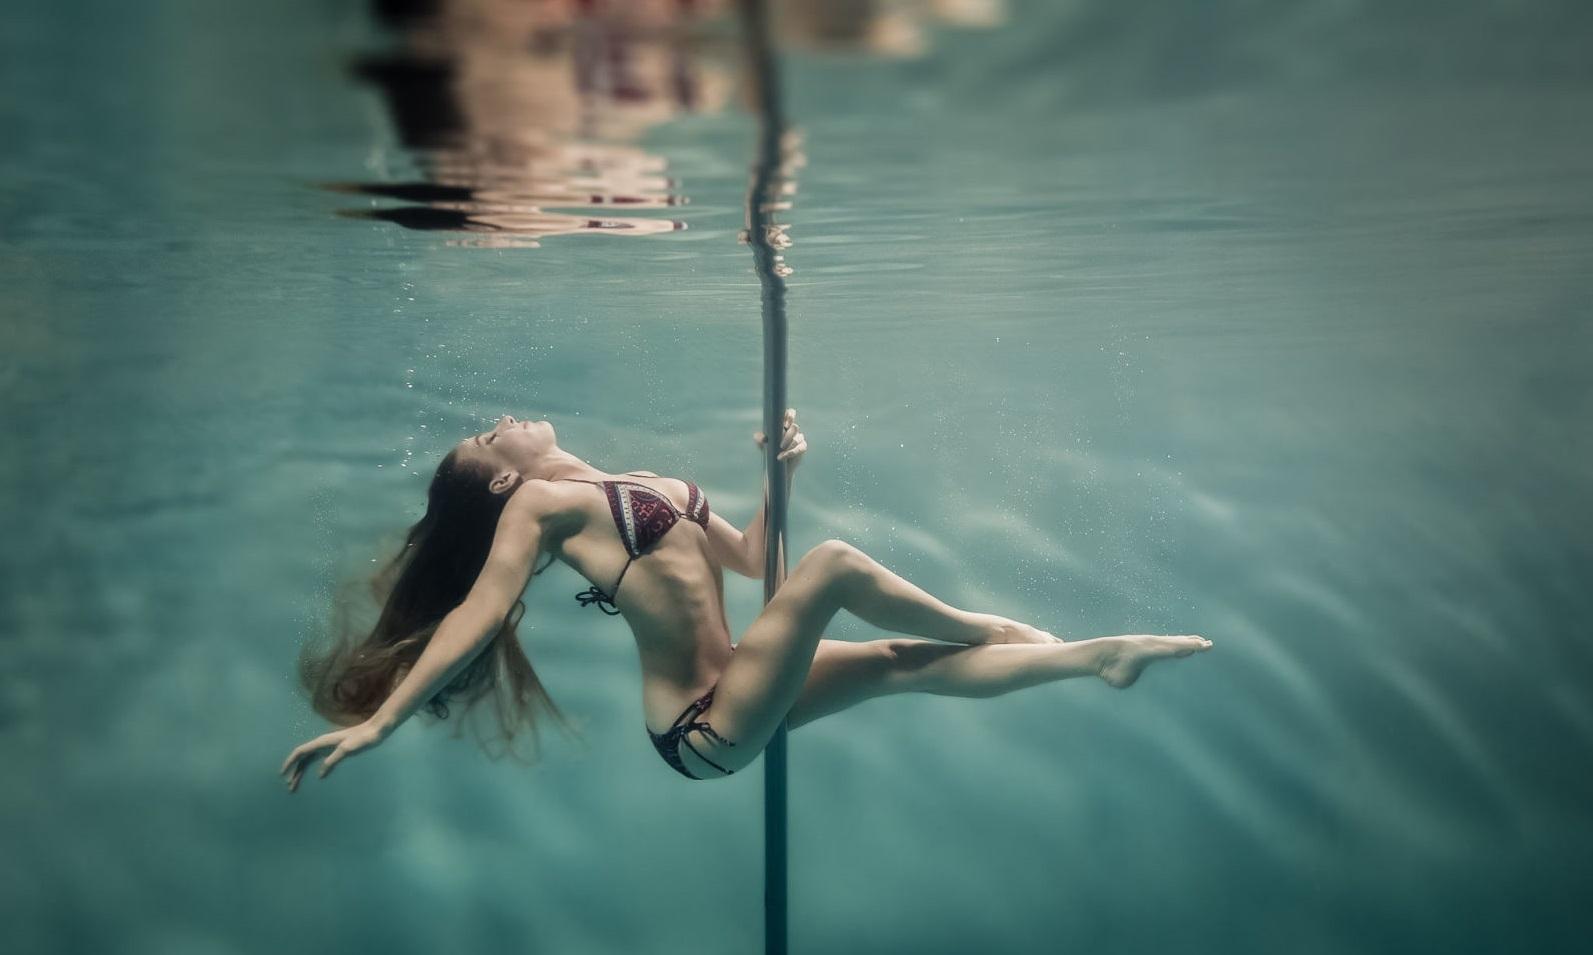 Incredible Underwater Pole Dancing Photographs By Brett Stanley